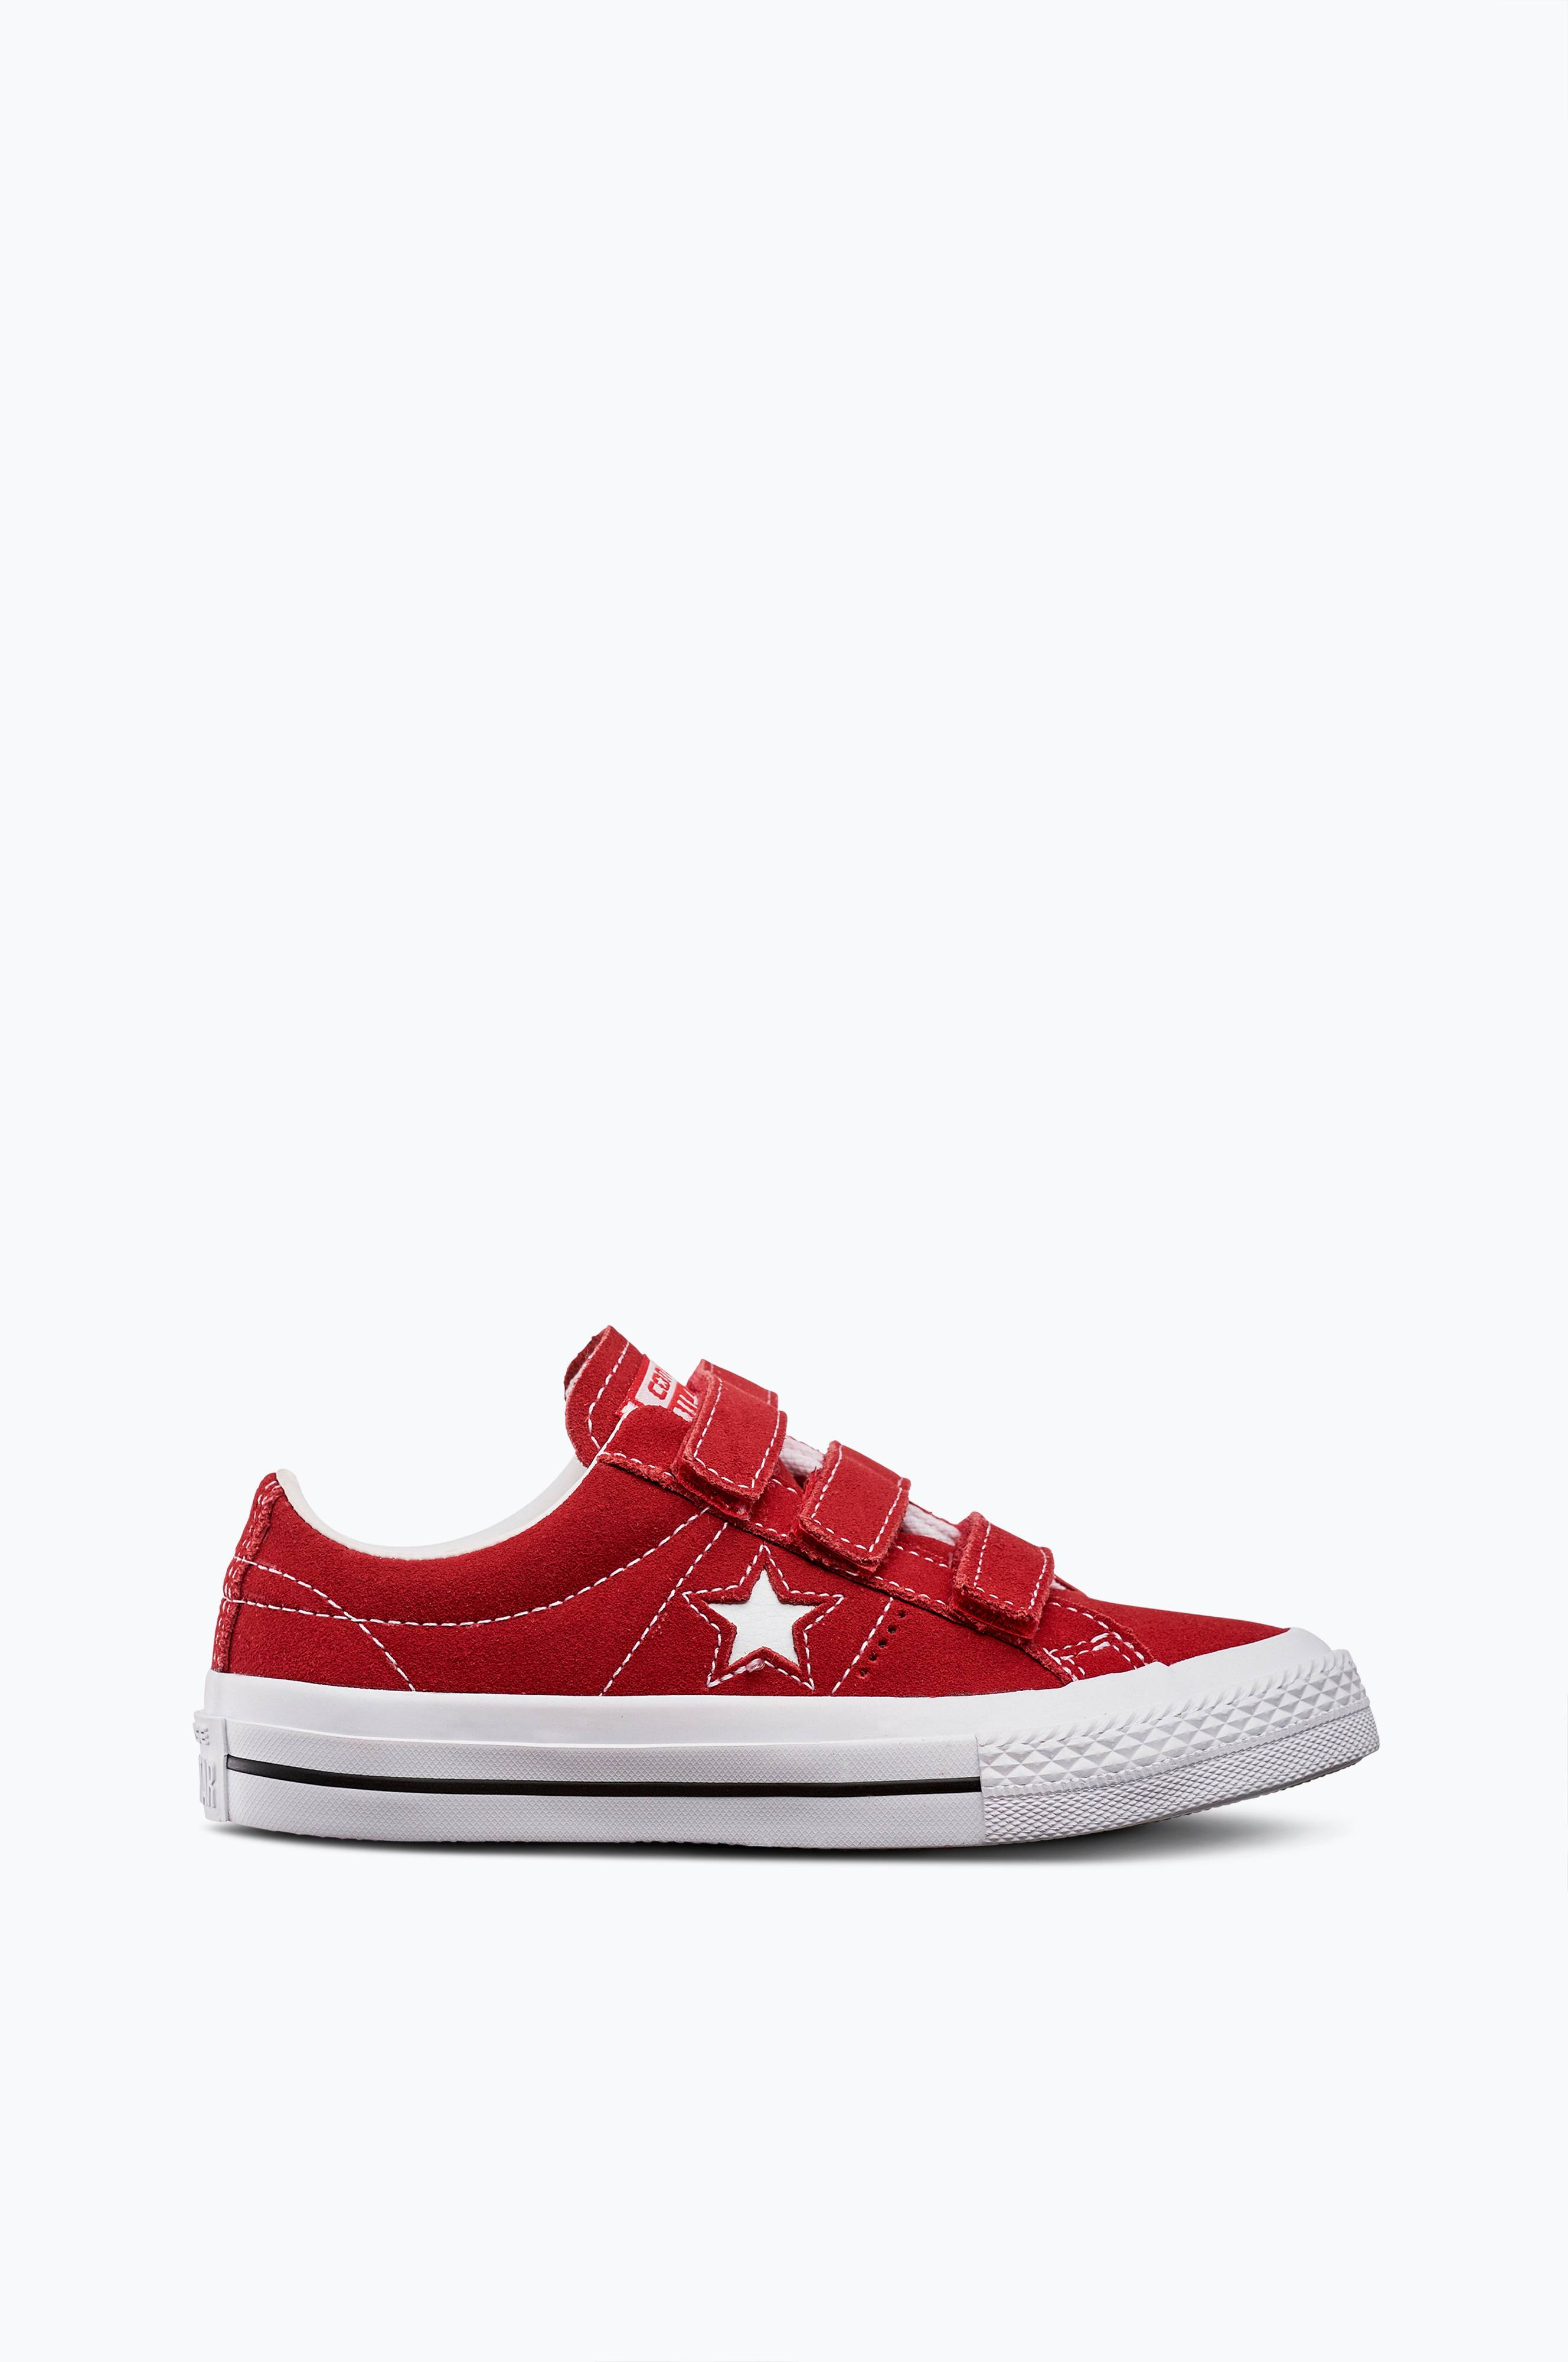 Converse Sneakers One Star 3v i mocka - Röd - Barn - Ellos.se 3ebd077171288